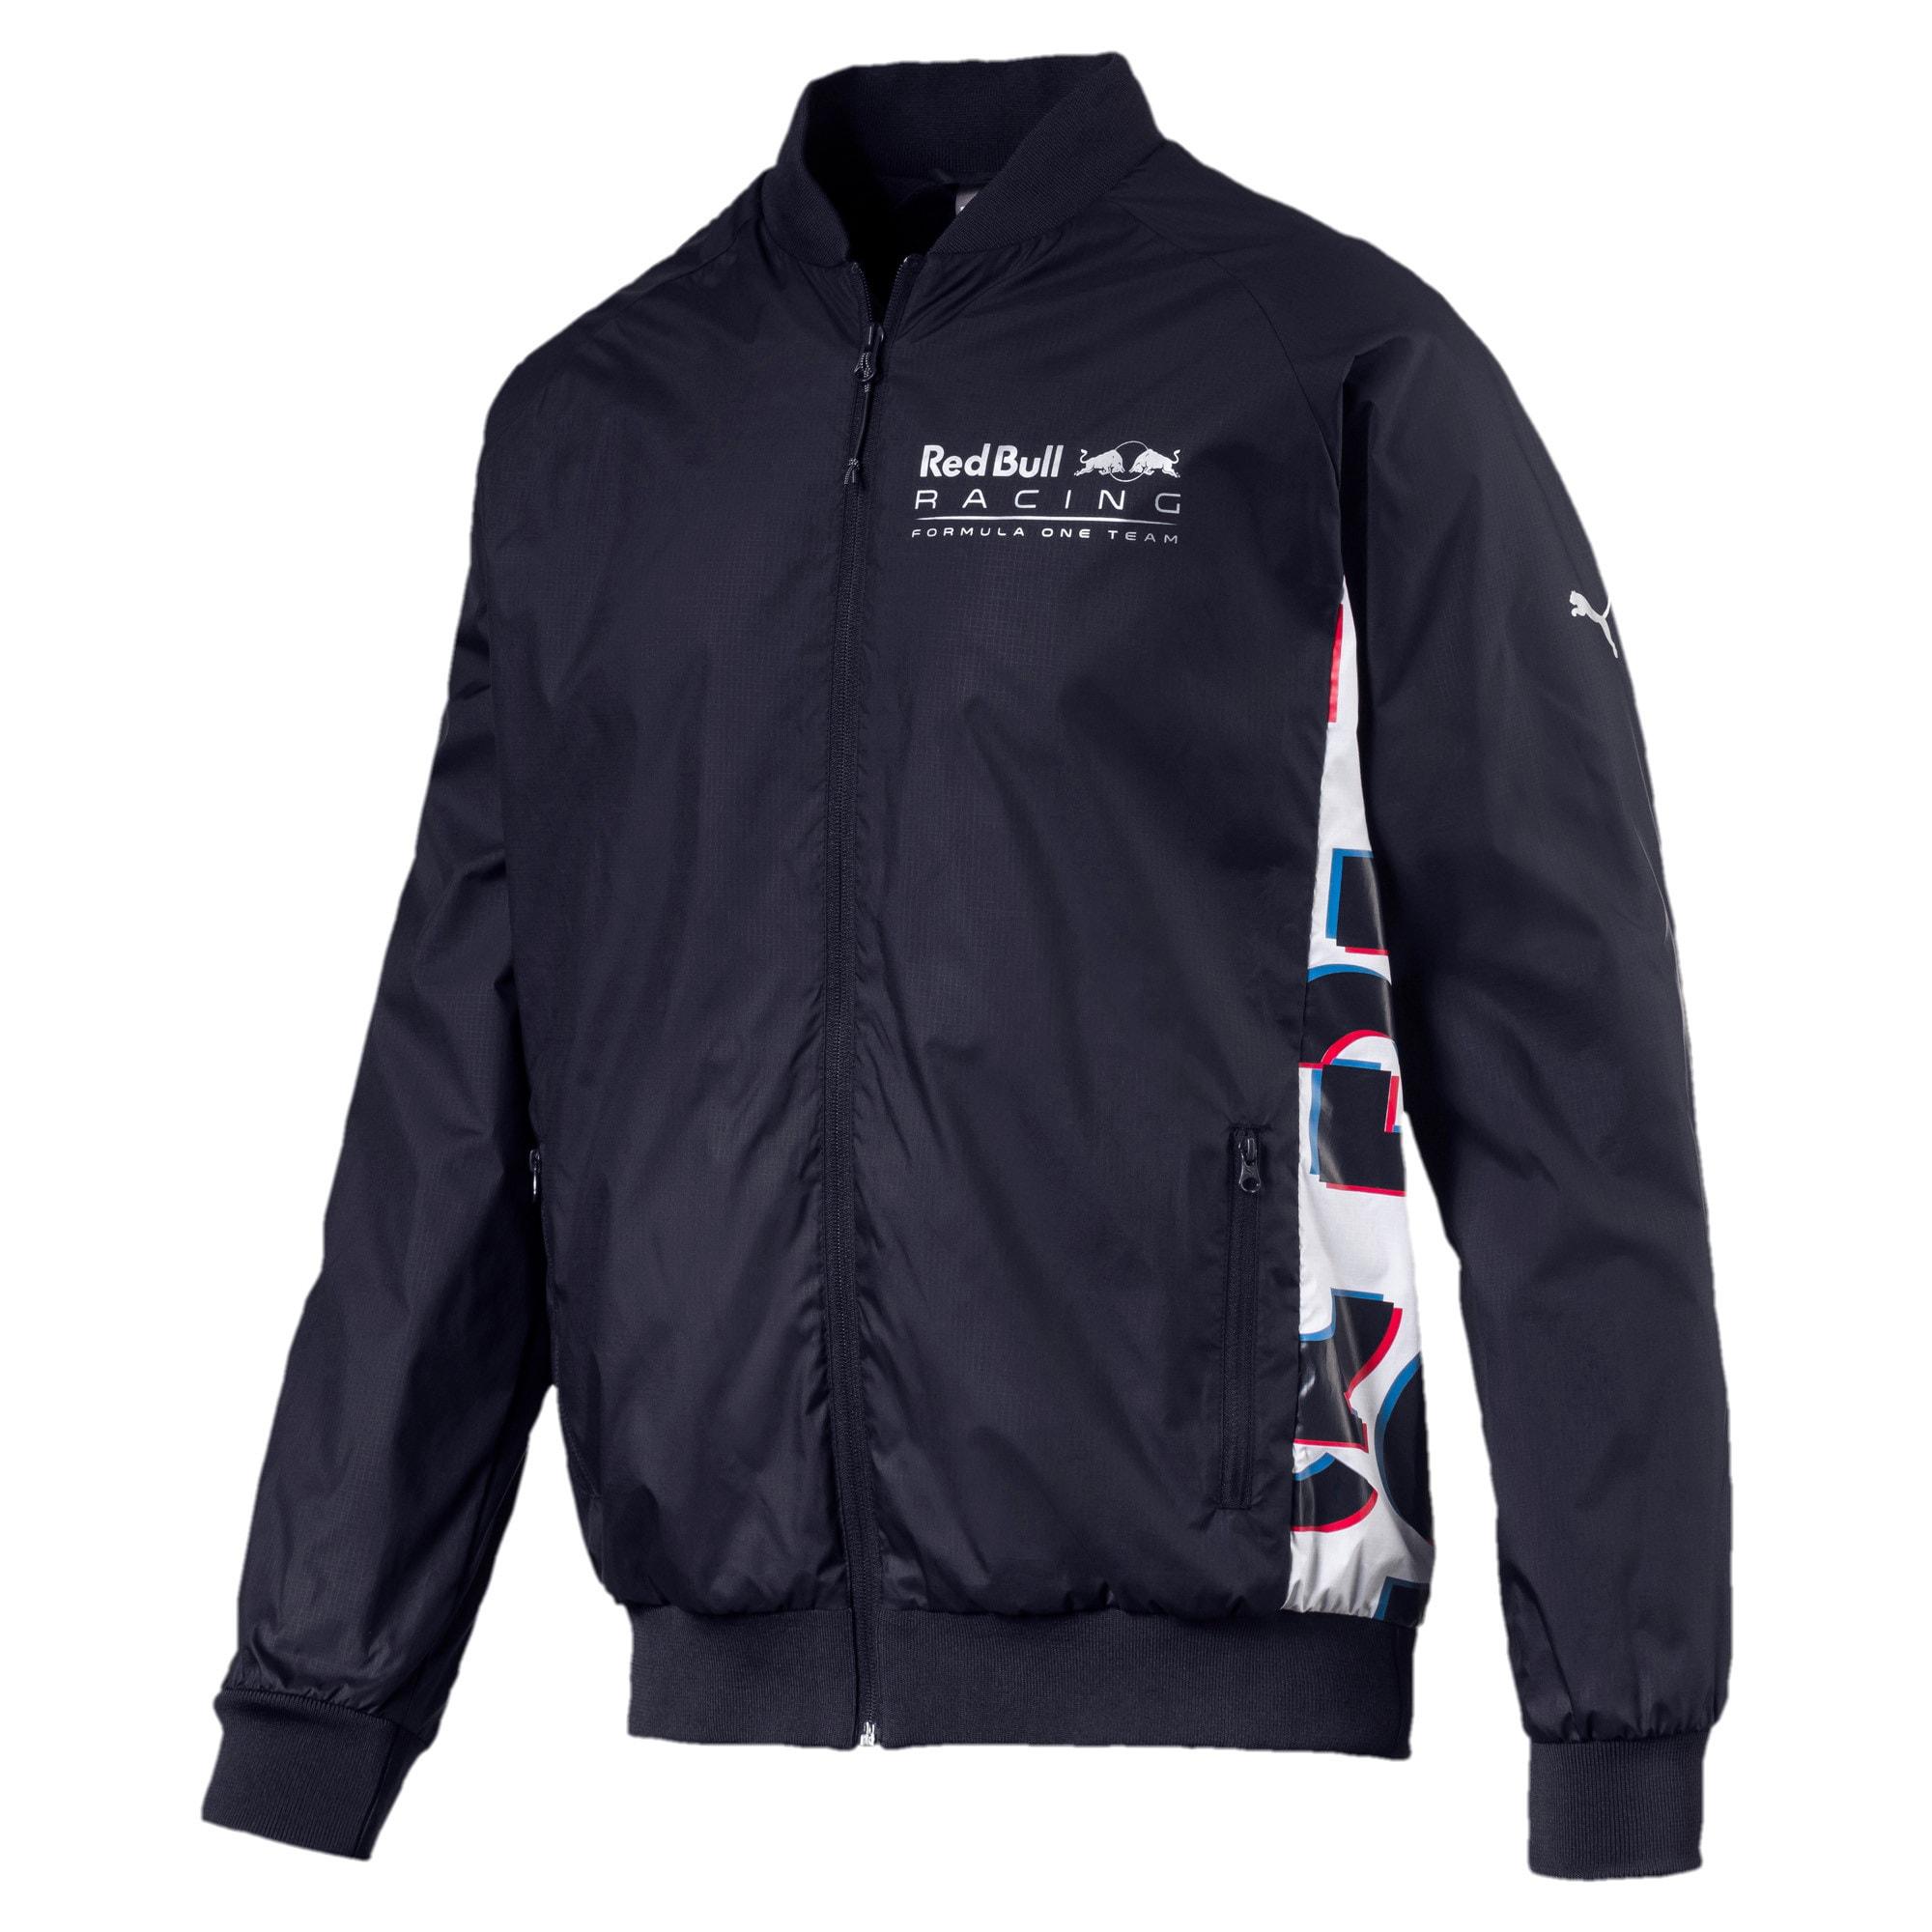 Thumbnail 1 of Red Bull Racing NightCat Men's Jacket, NIGHT SKY, medium-IND